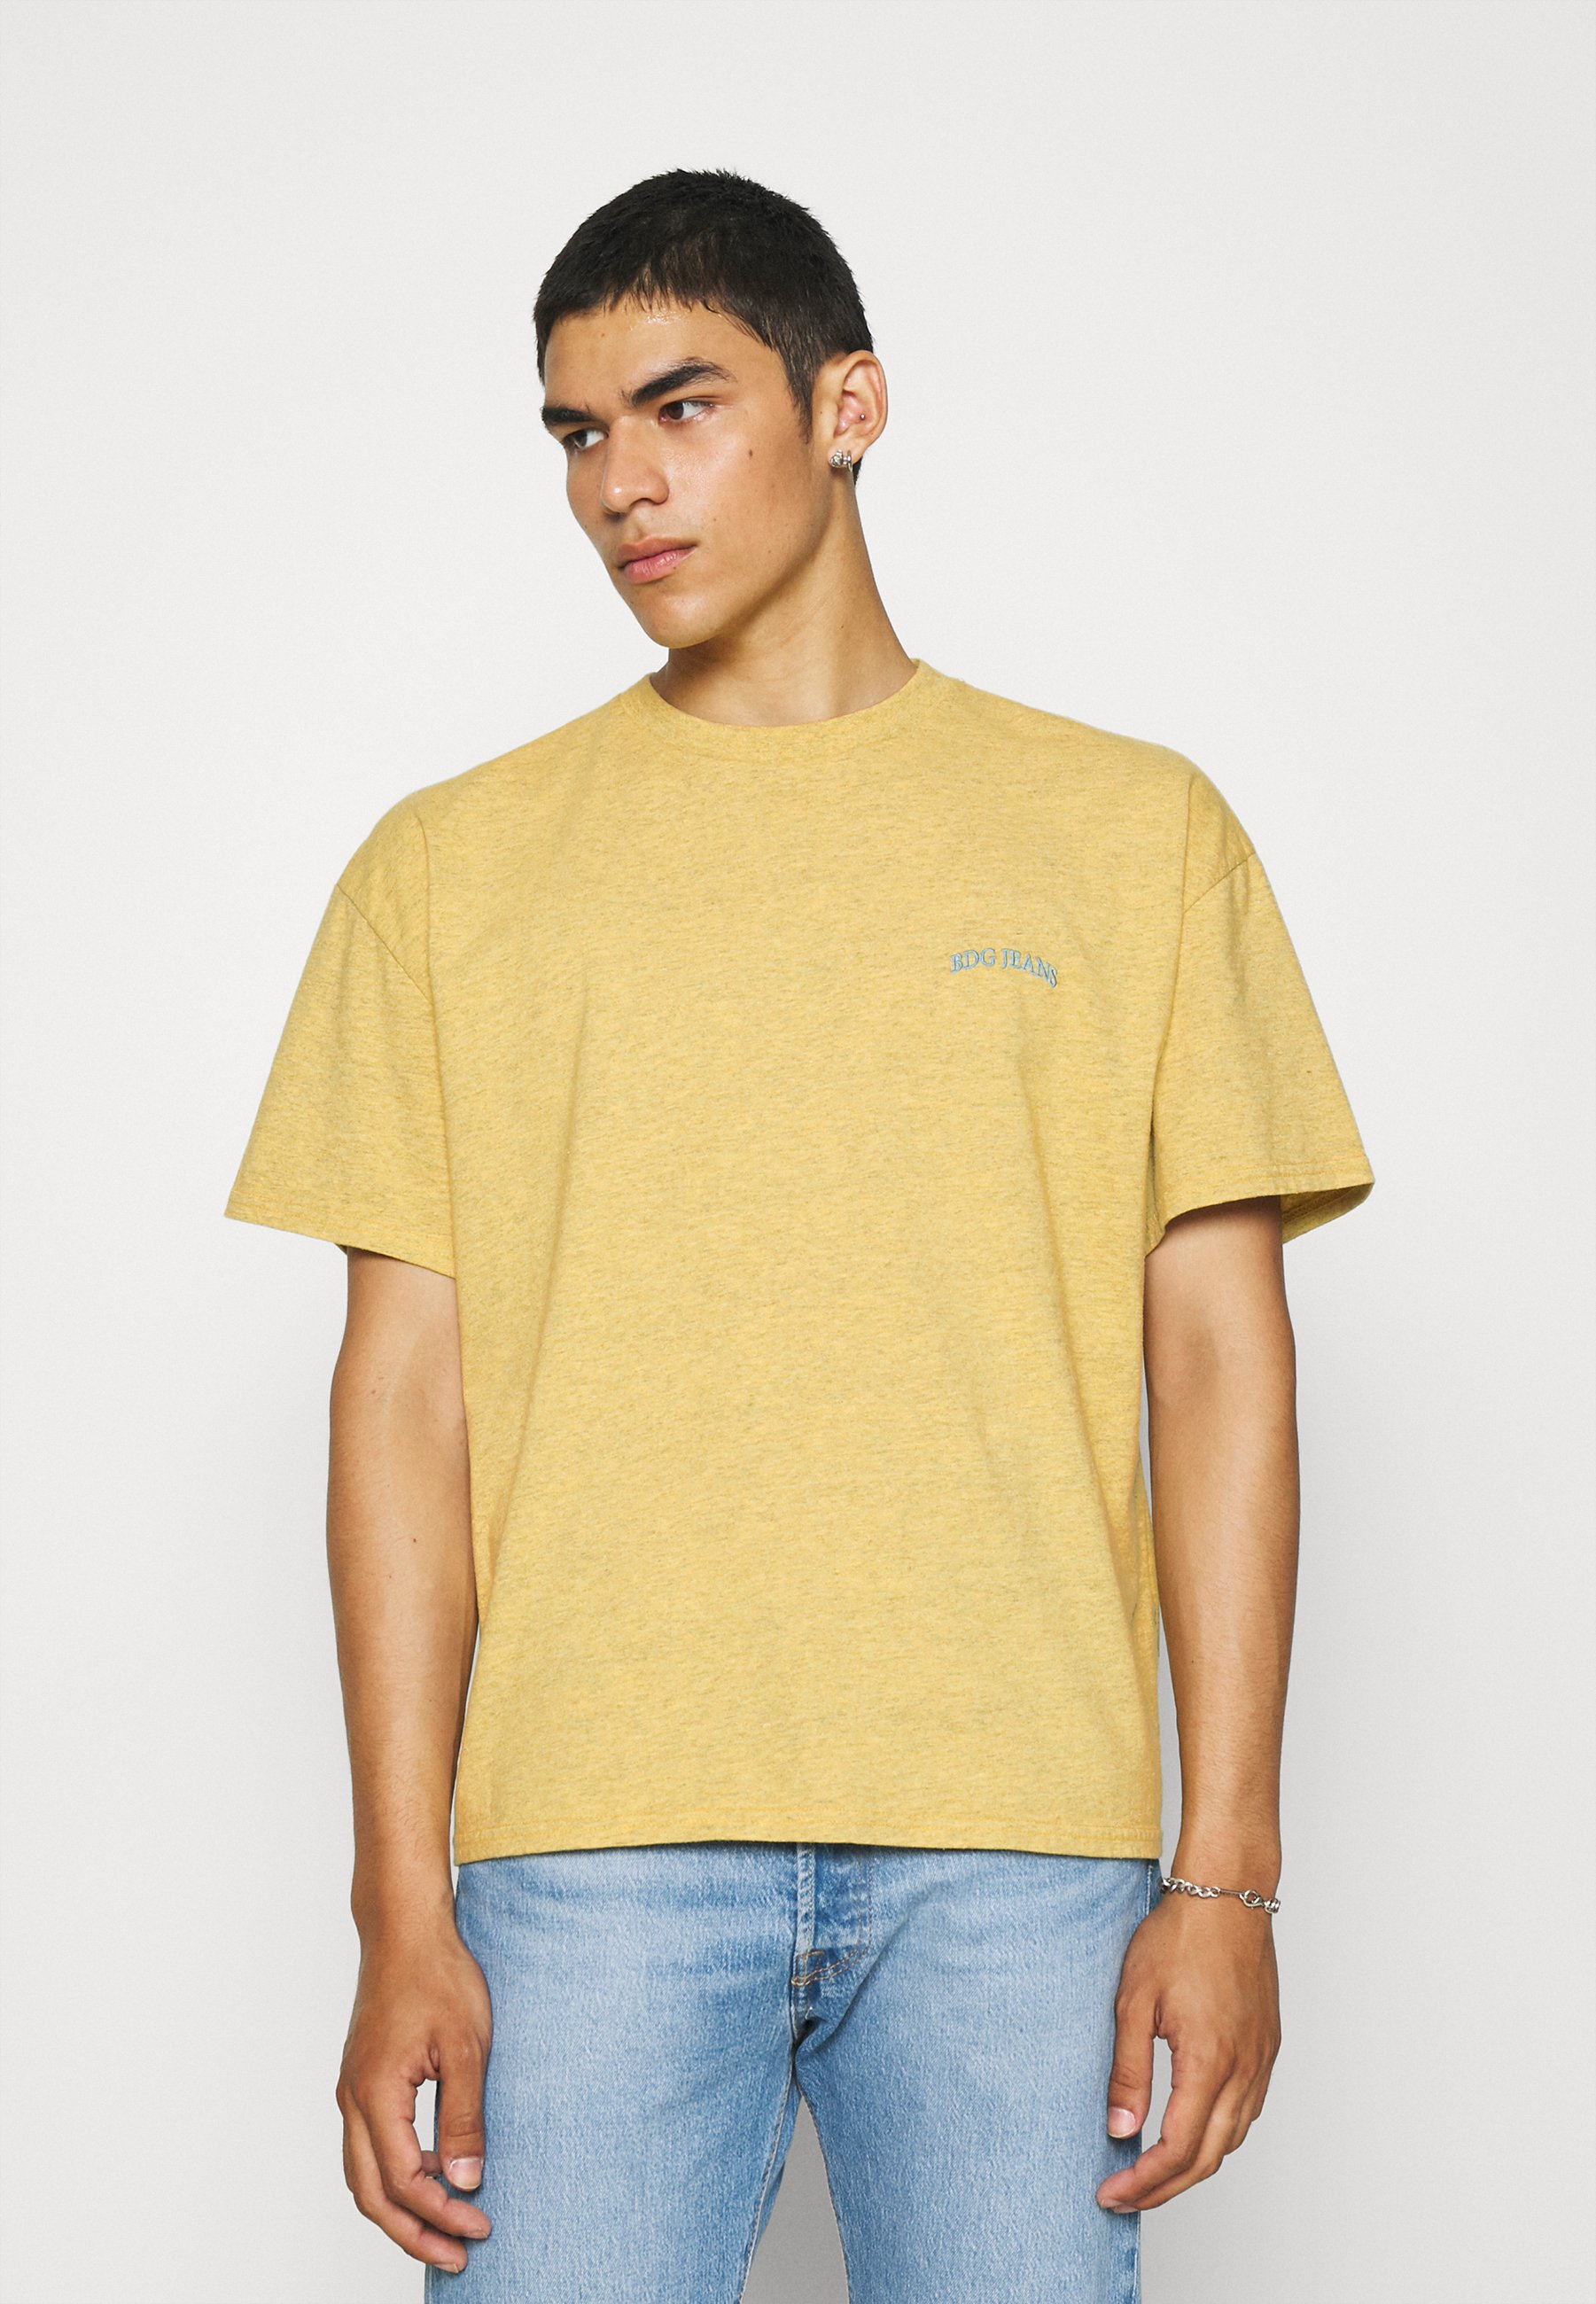 Homme MARLED LOGO EMBROIDERED TEE UNISEX - T-shirt basique